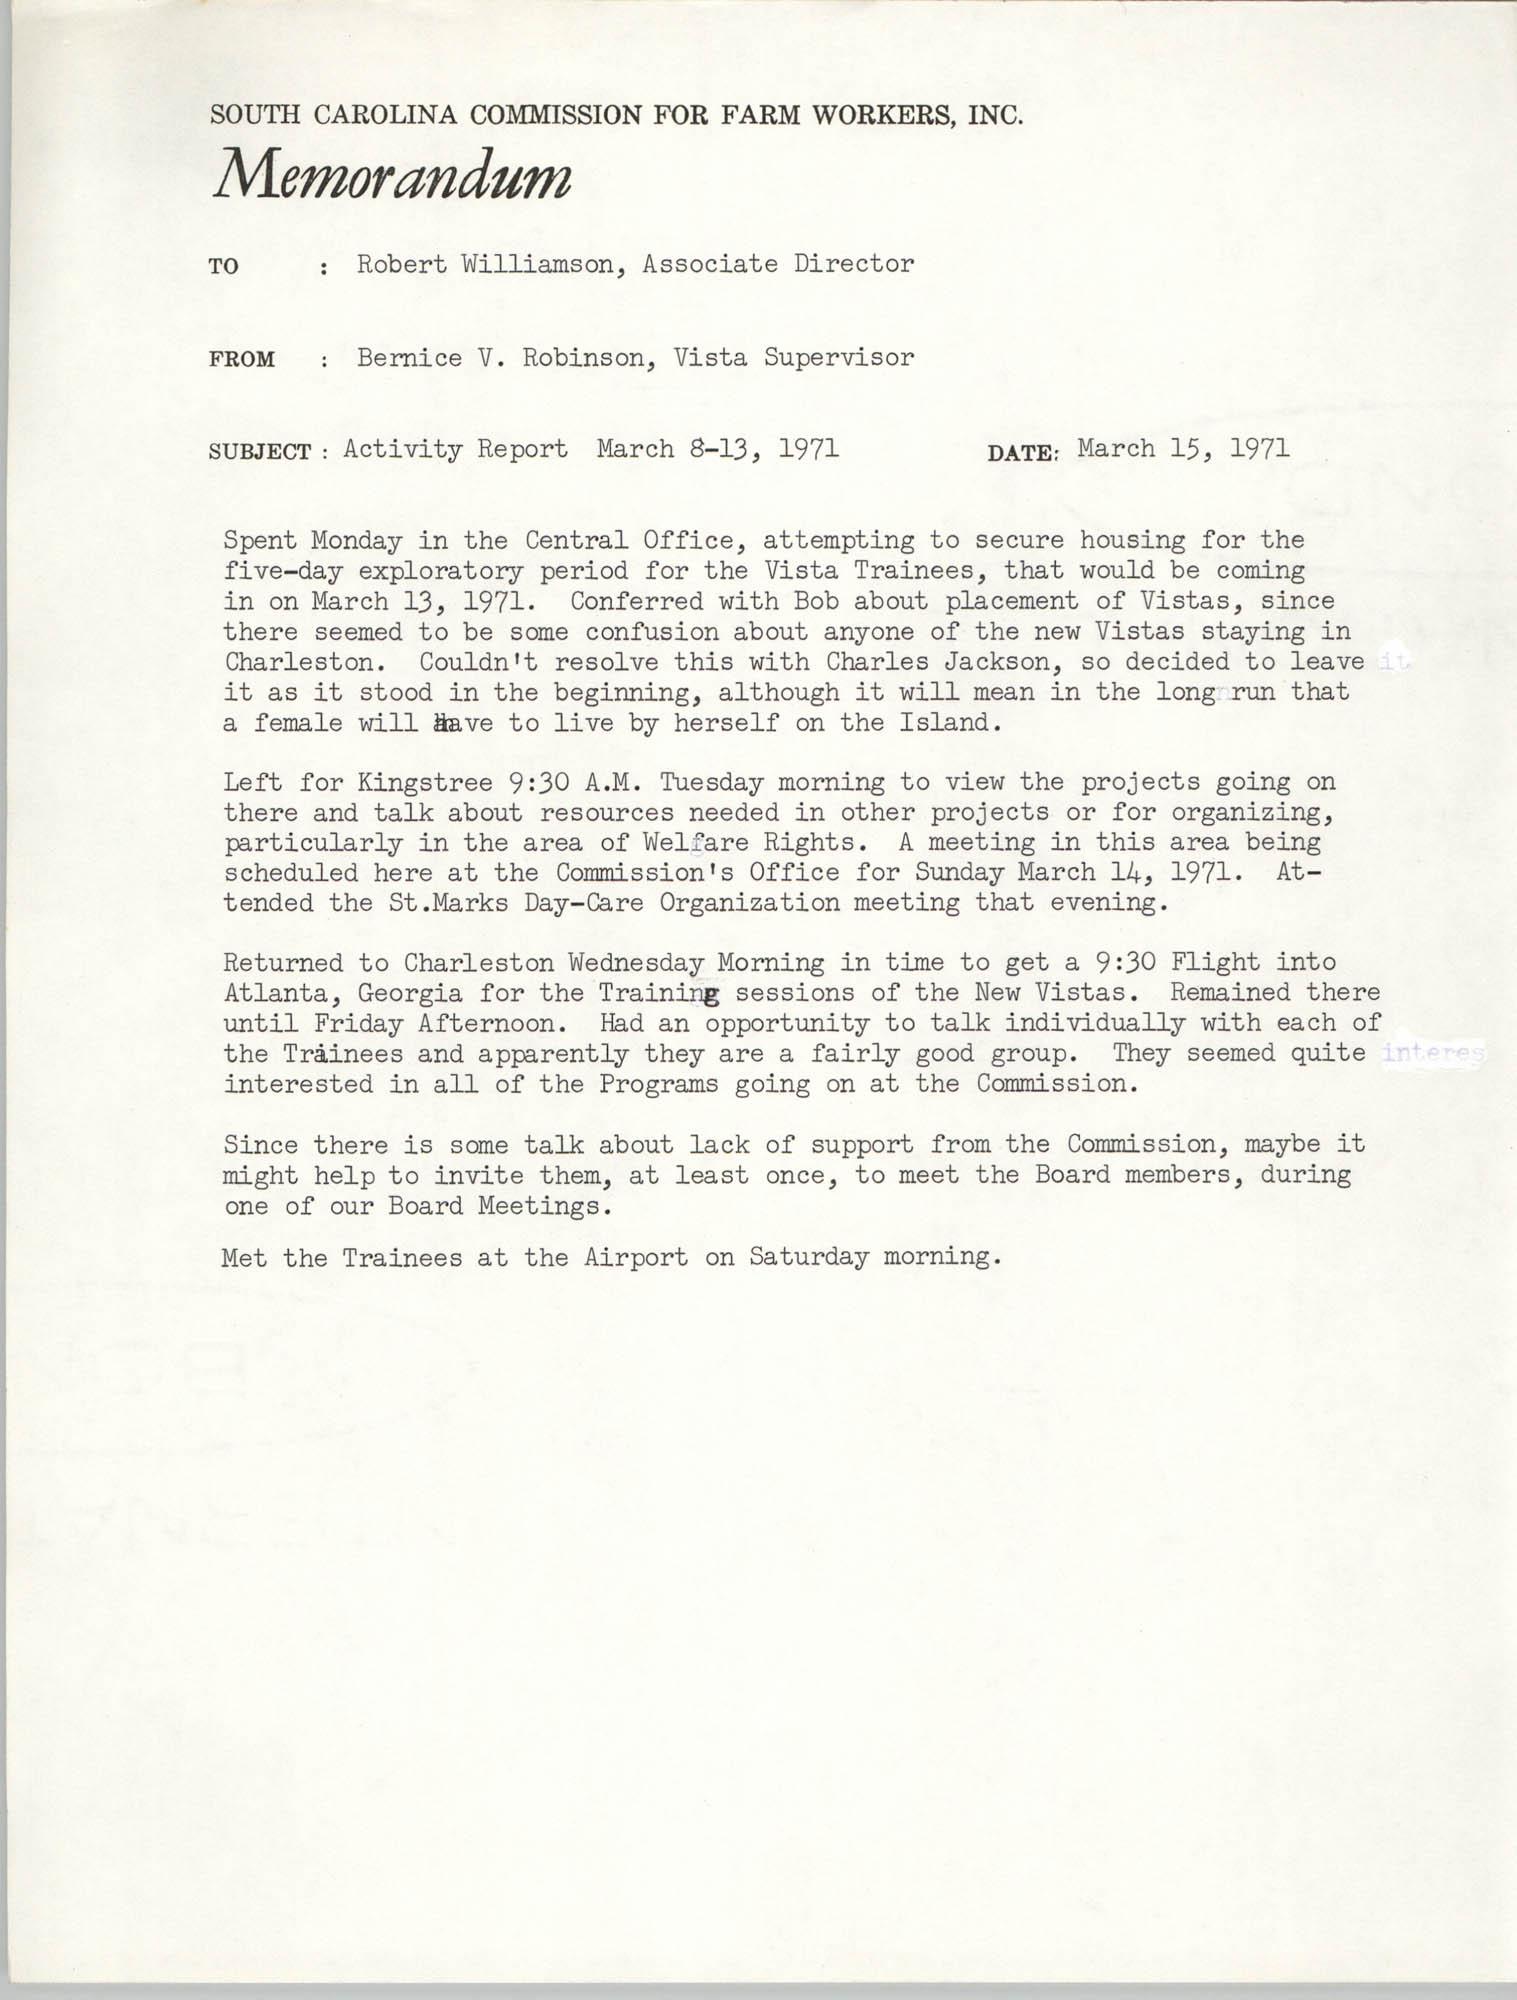 Memorandum from Bernice V. Robinson to Robert Williamson, March 15, 1971